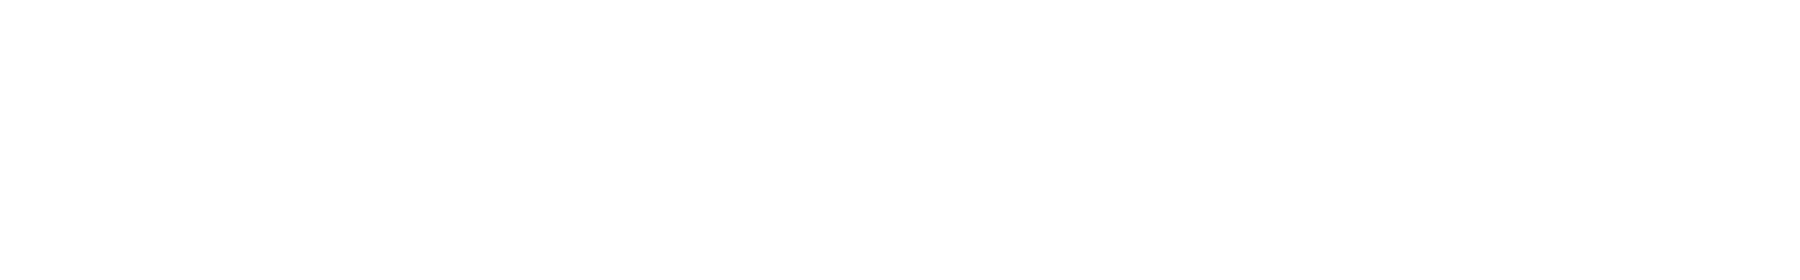 channa flute